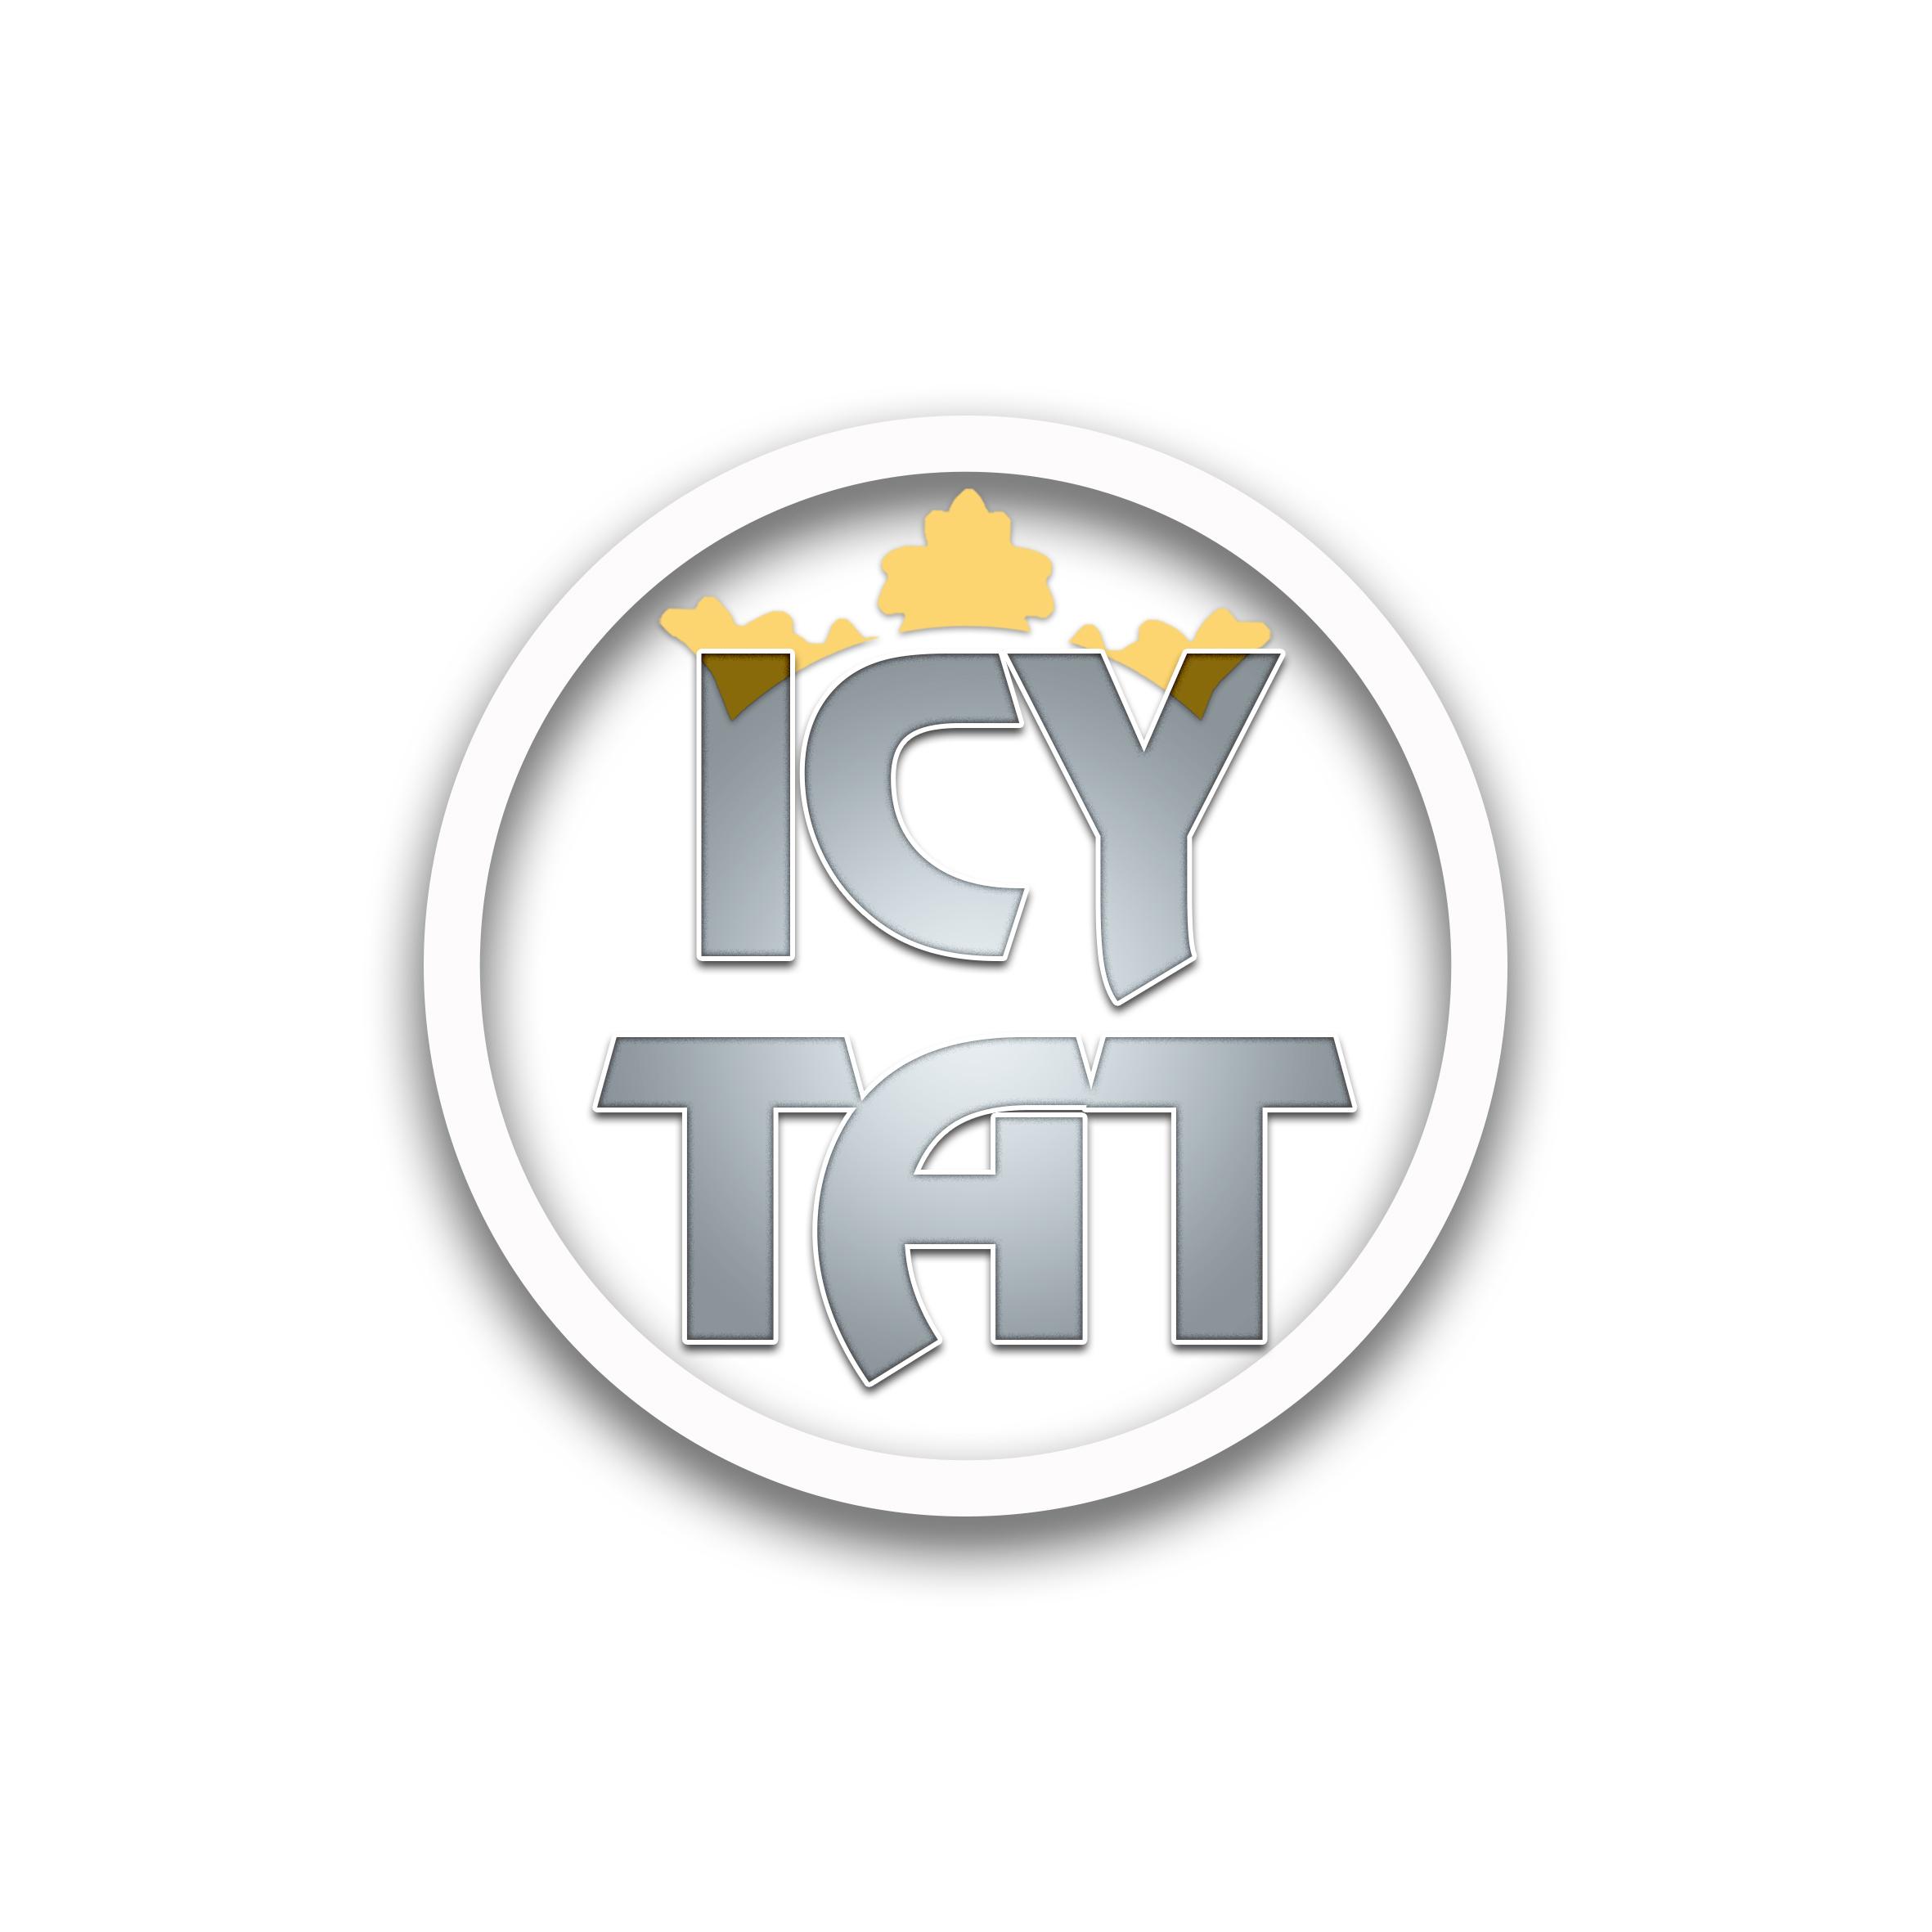 Jonas Blue Ft Dakota Fast Car Icytat Remix By Icytat - Fast car by jonas blue mp3 download